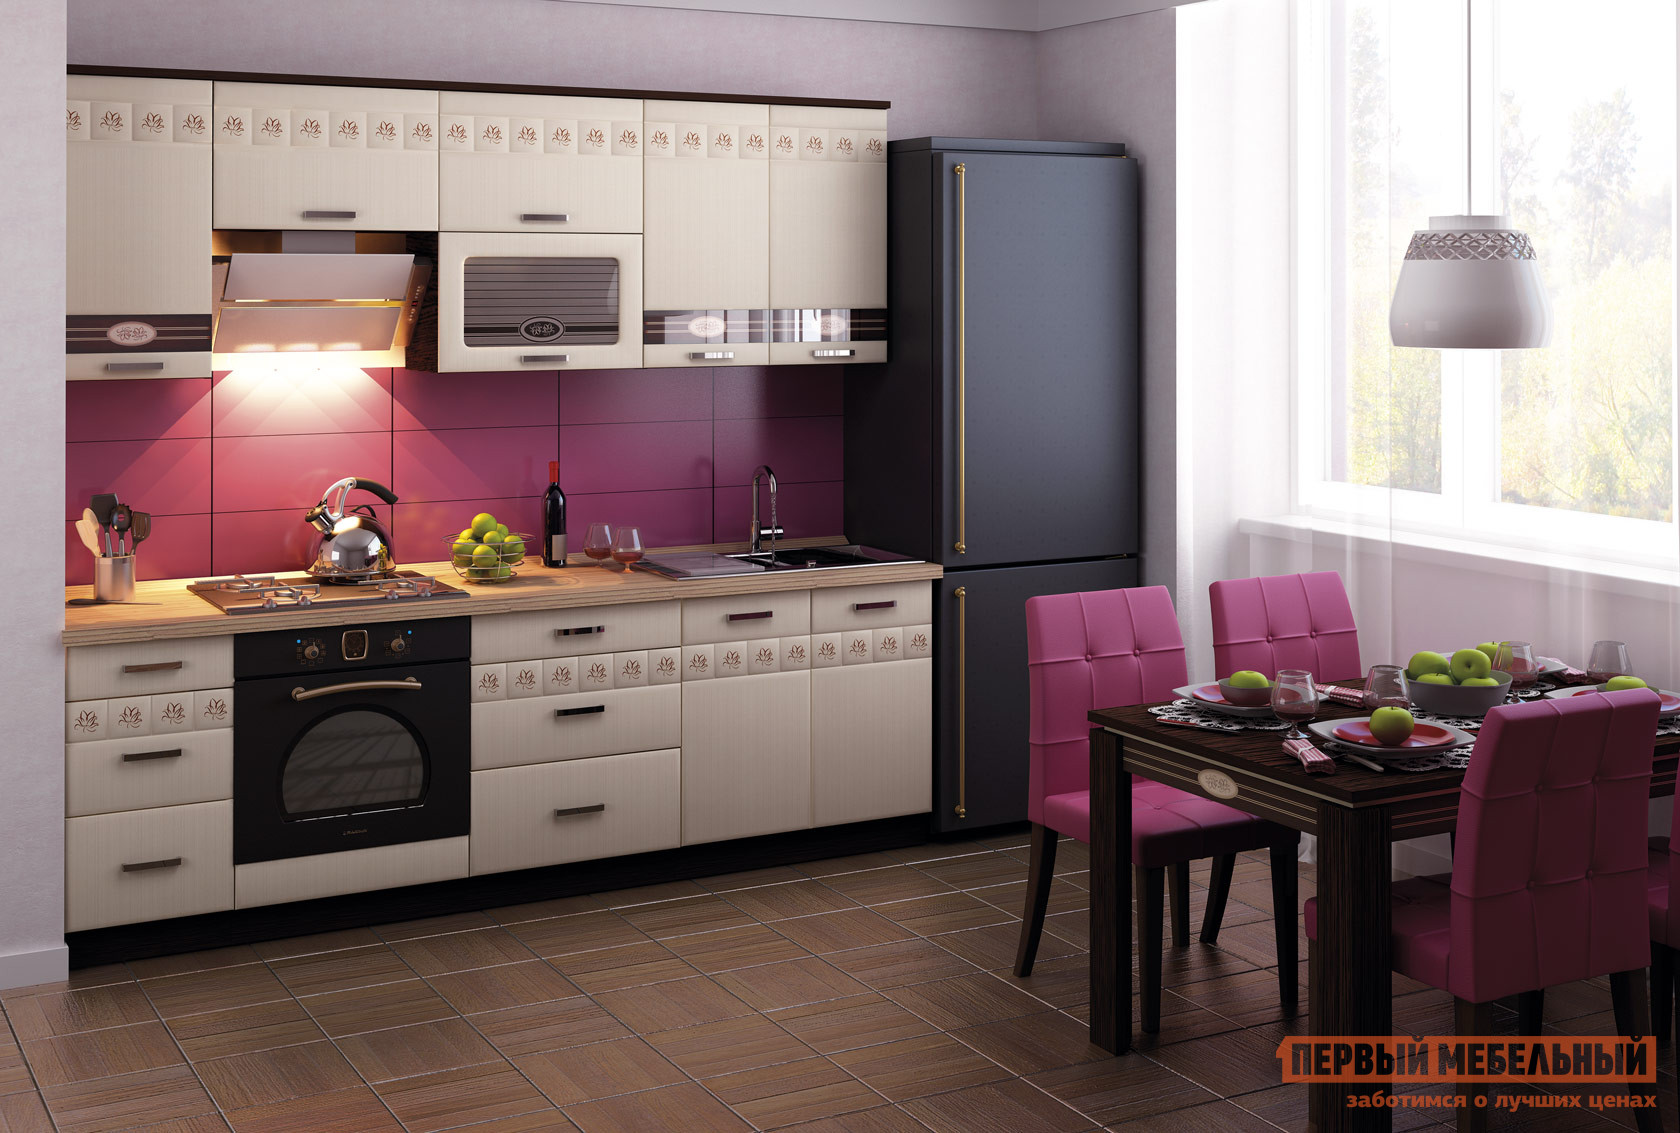 Кухонный гарнитур Витра Аврора 240 кухонный гарнитур витра глория 3 к1